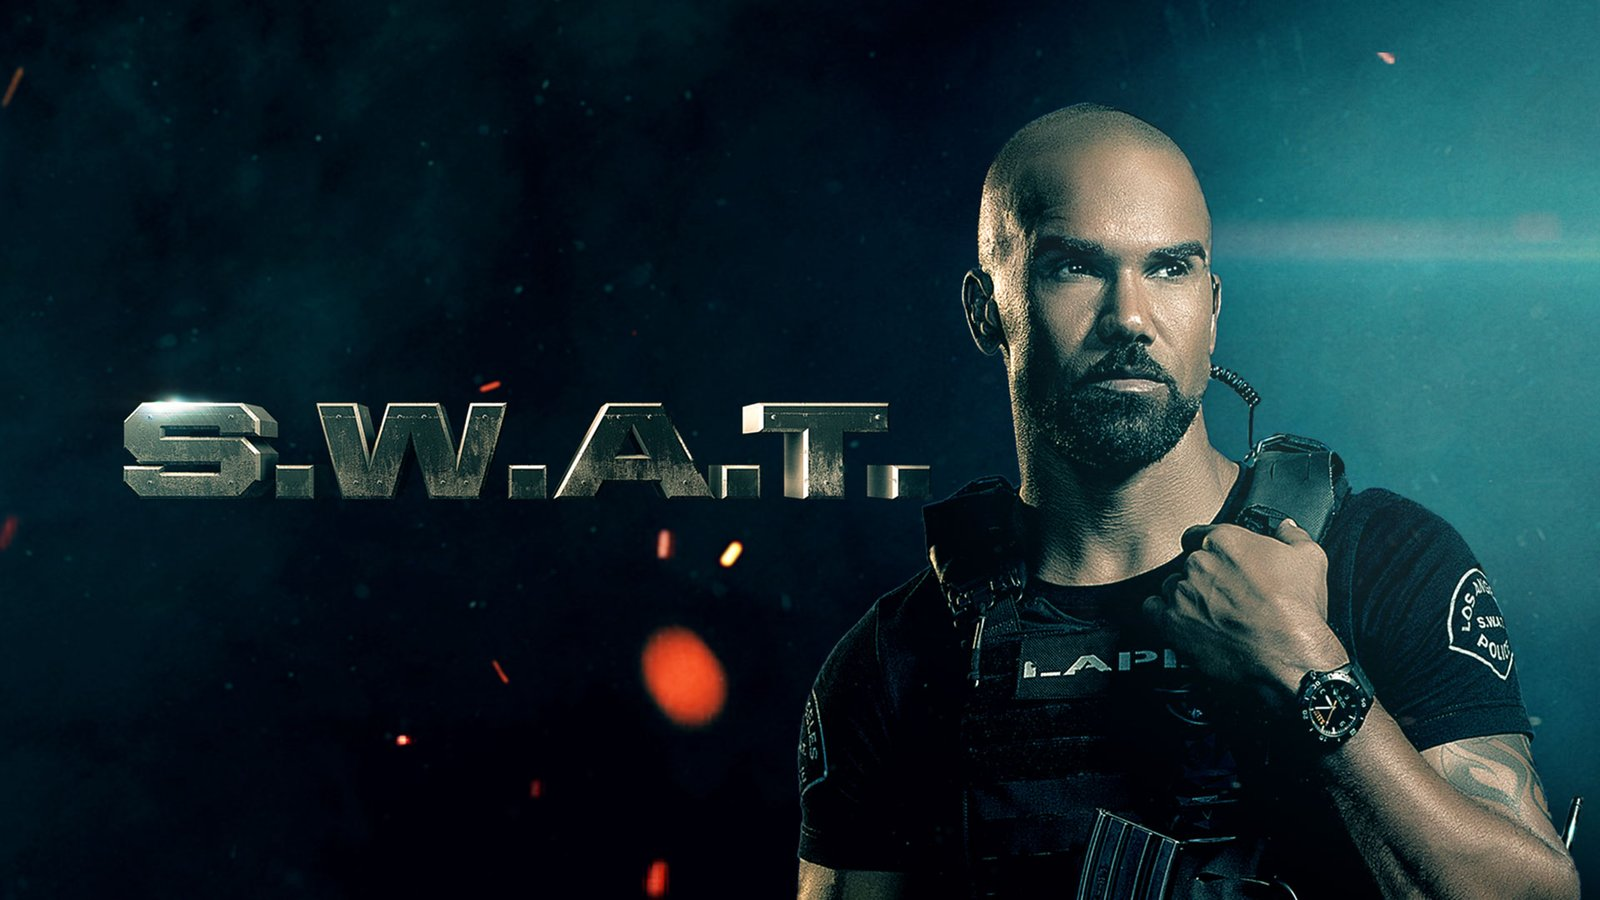 Спецназ / S.W.A.T.